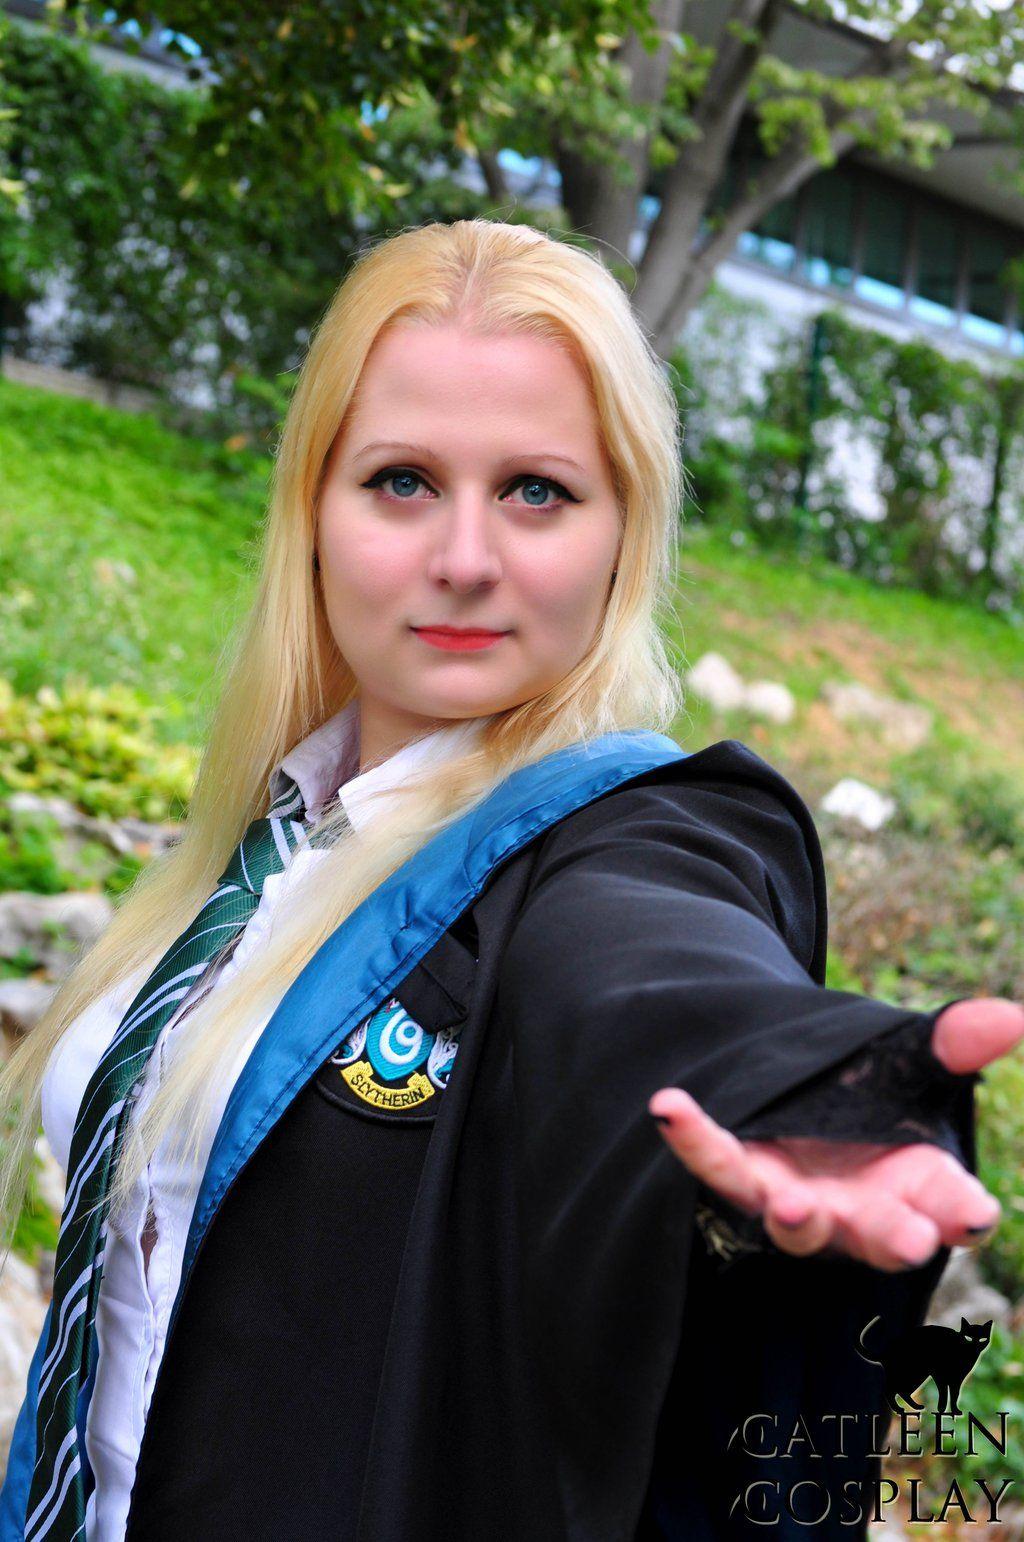 Daphne Greengrass Harry Potter Harry Potter Books Series Harry Potter Daphne